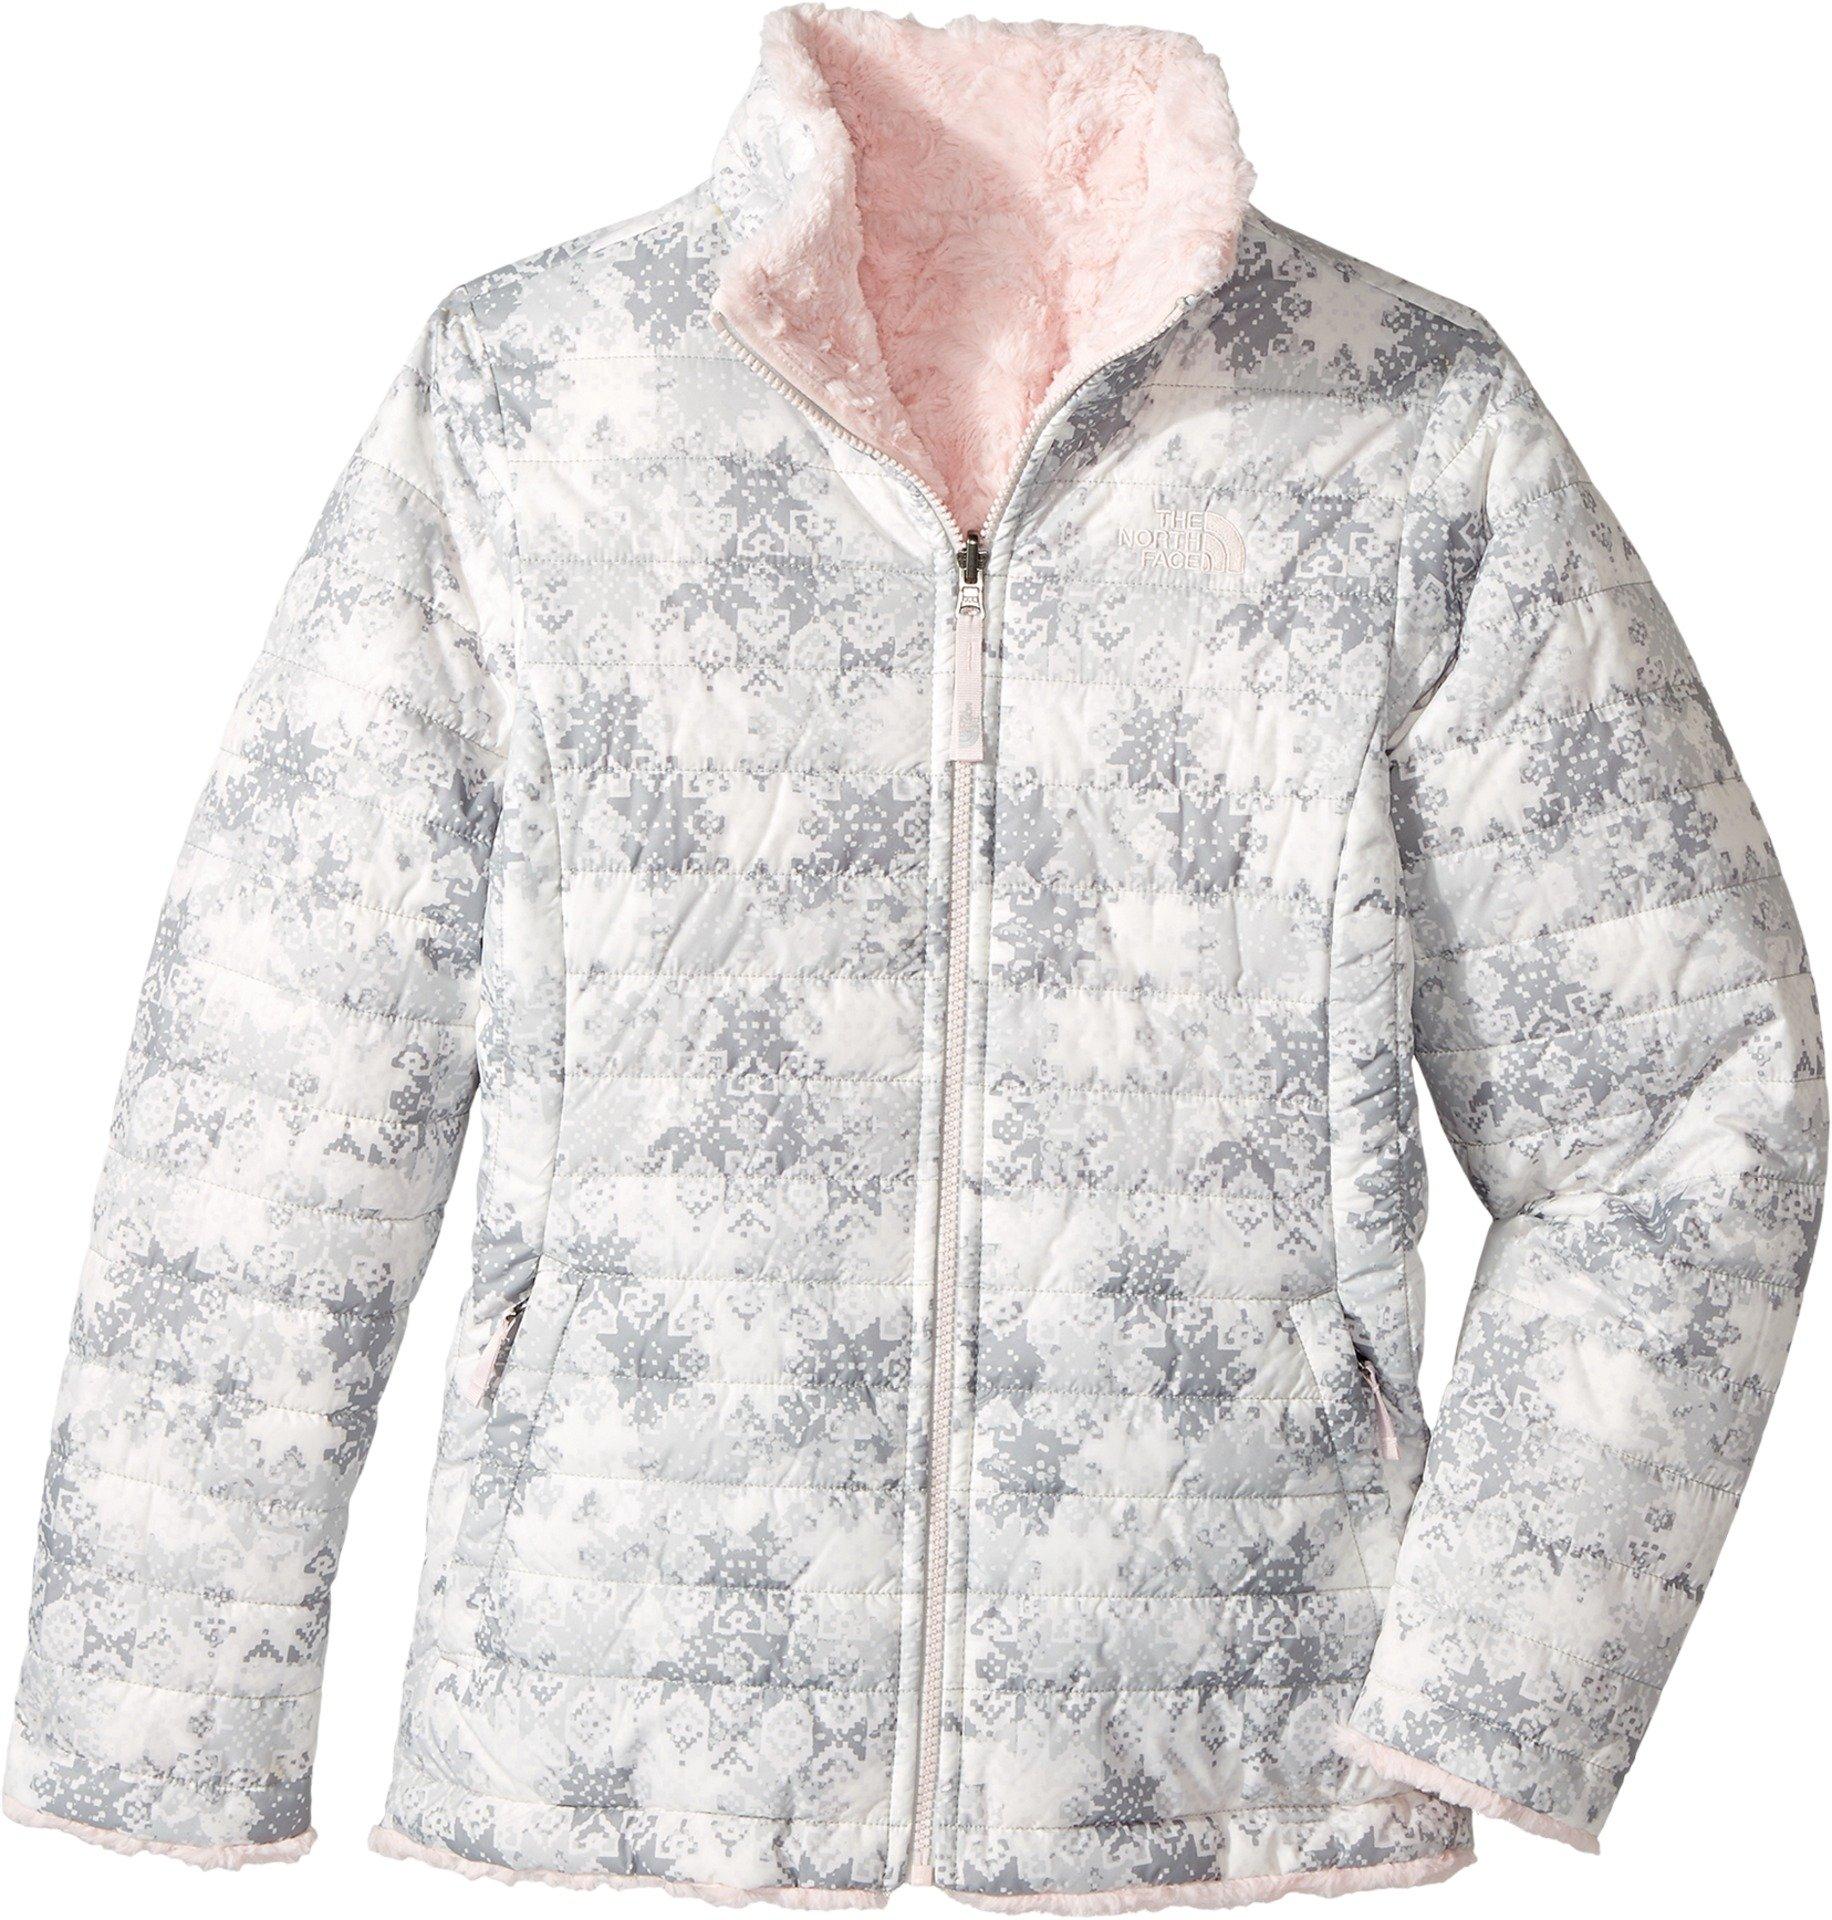 The North Face Girl's Reversible Mossbud Swirl Jacket - Algiers Blue Sponge Print - M (Past Season)